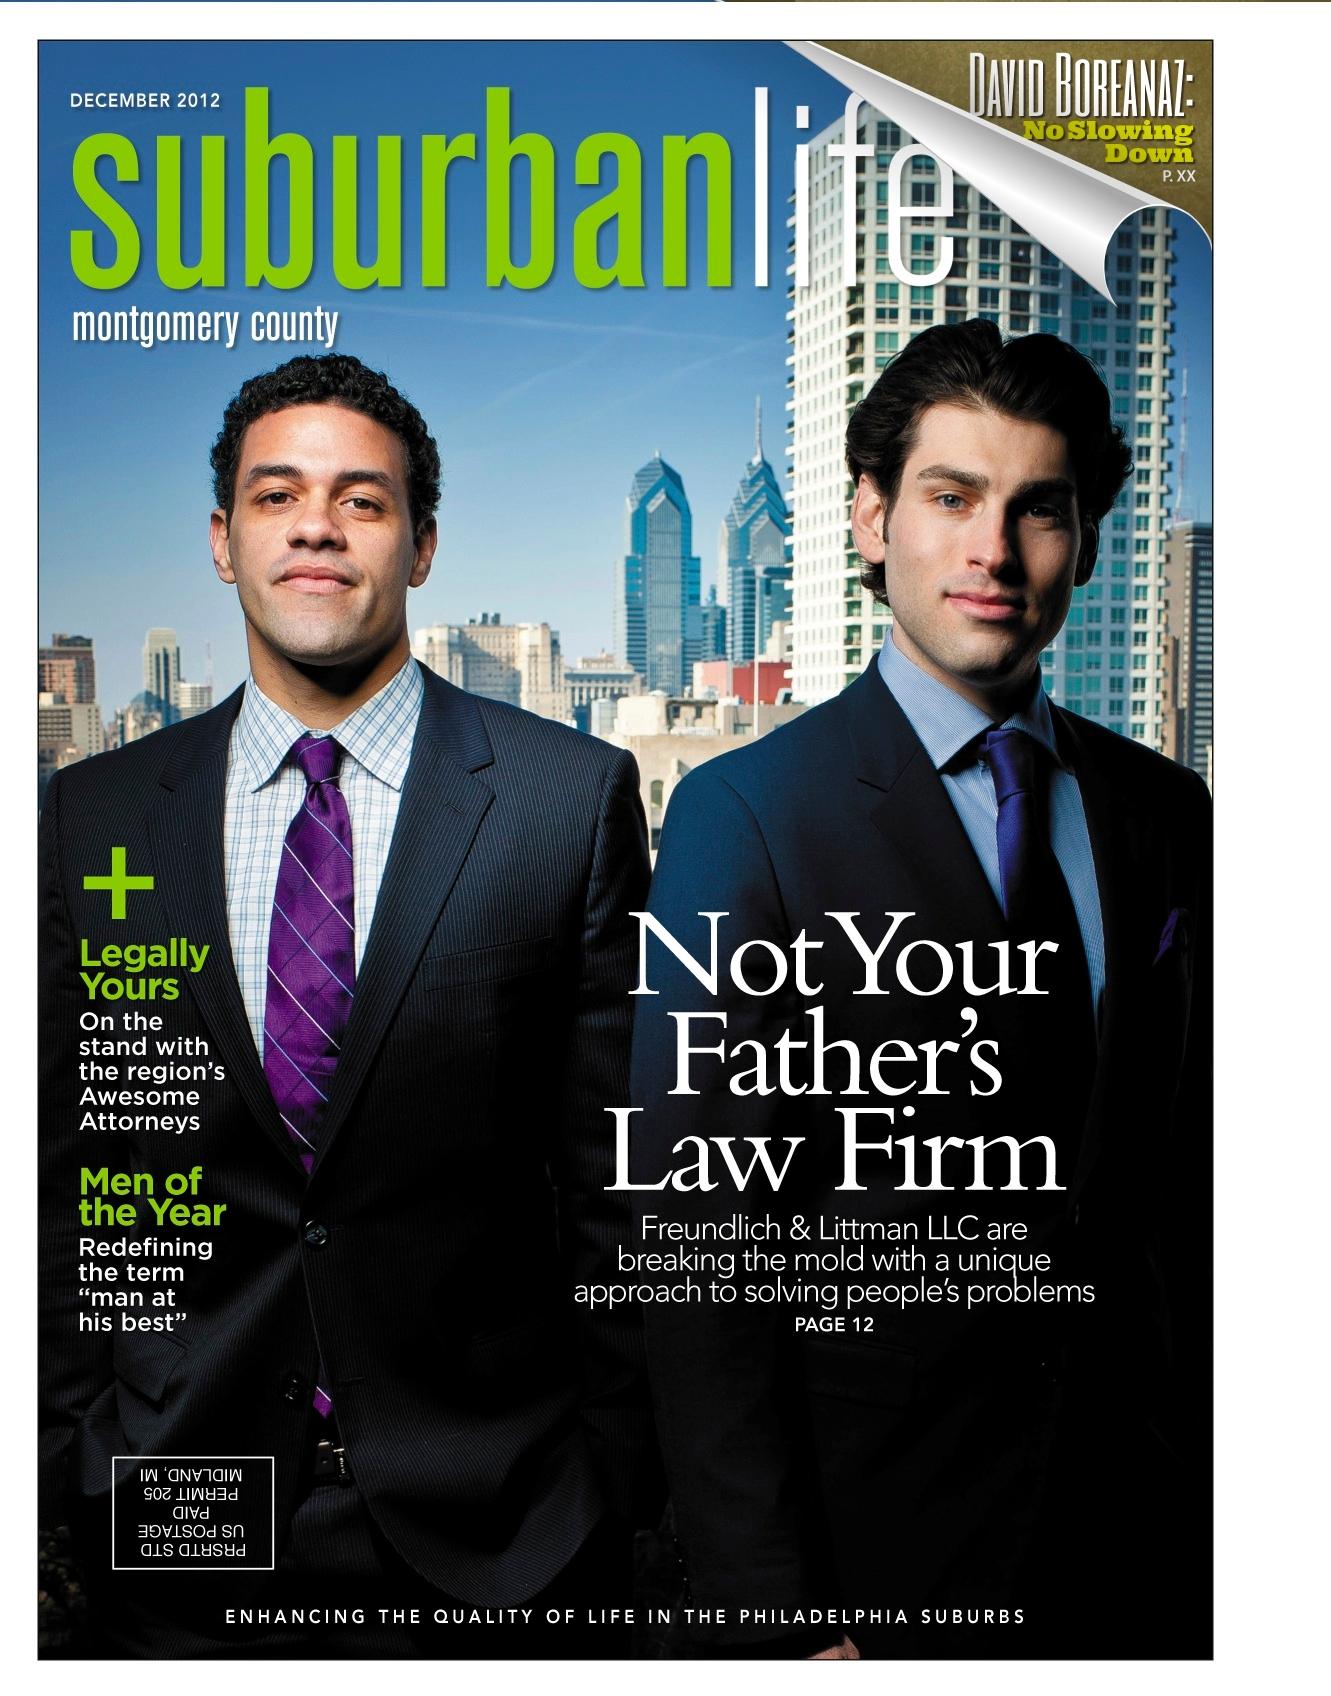 Freundlich & Littman, LLC